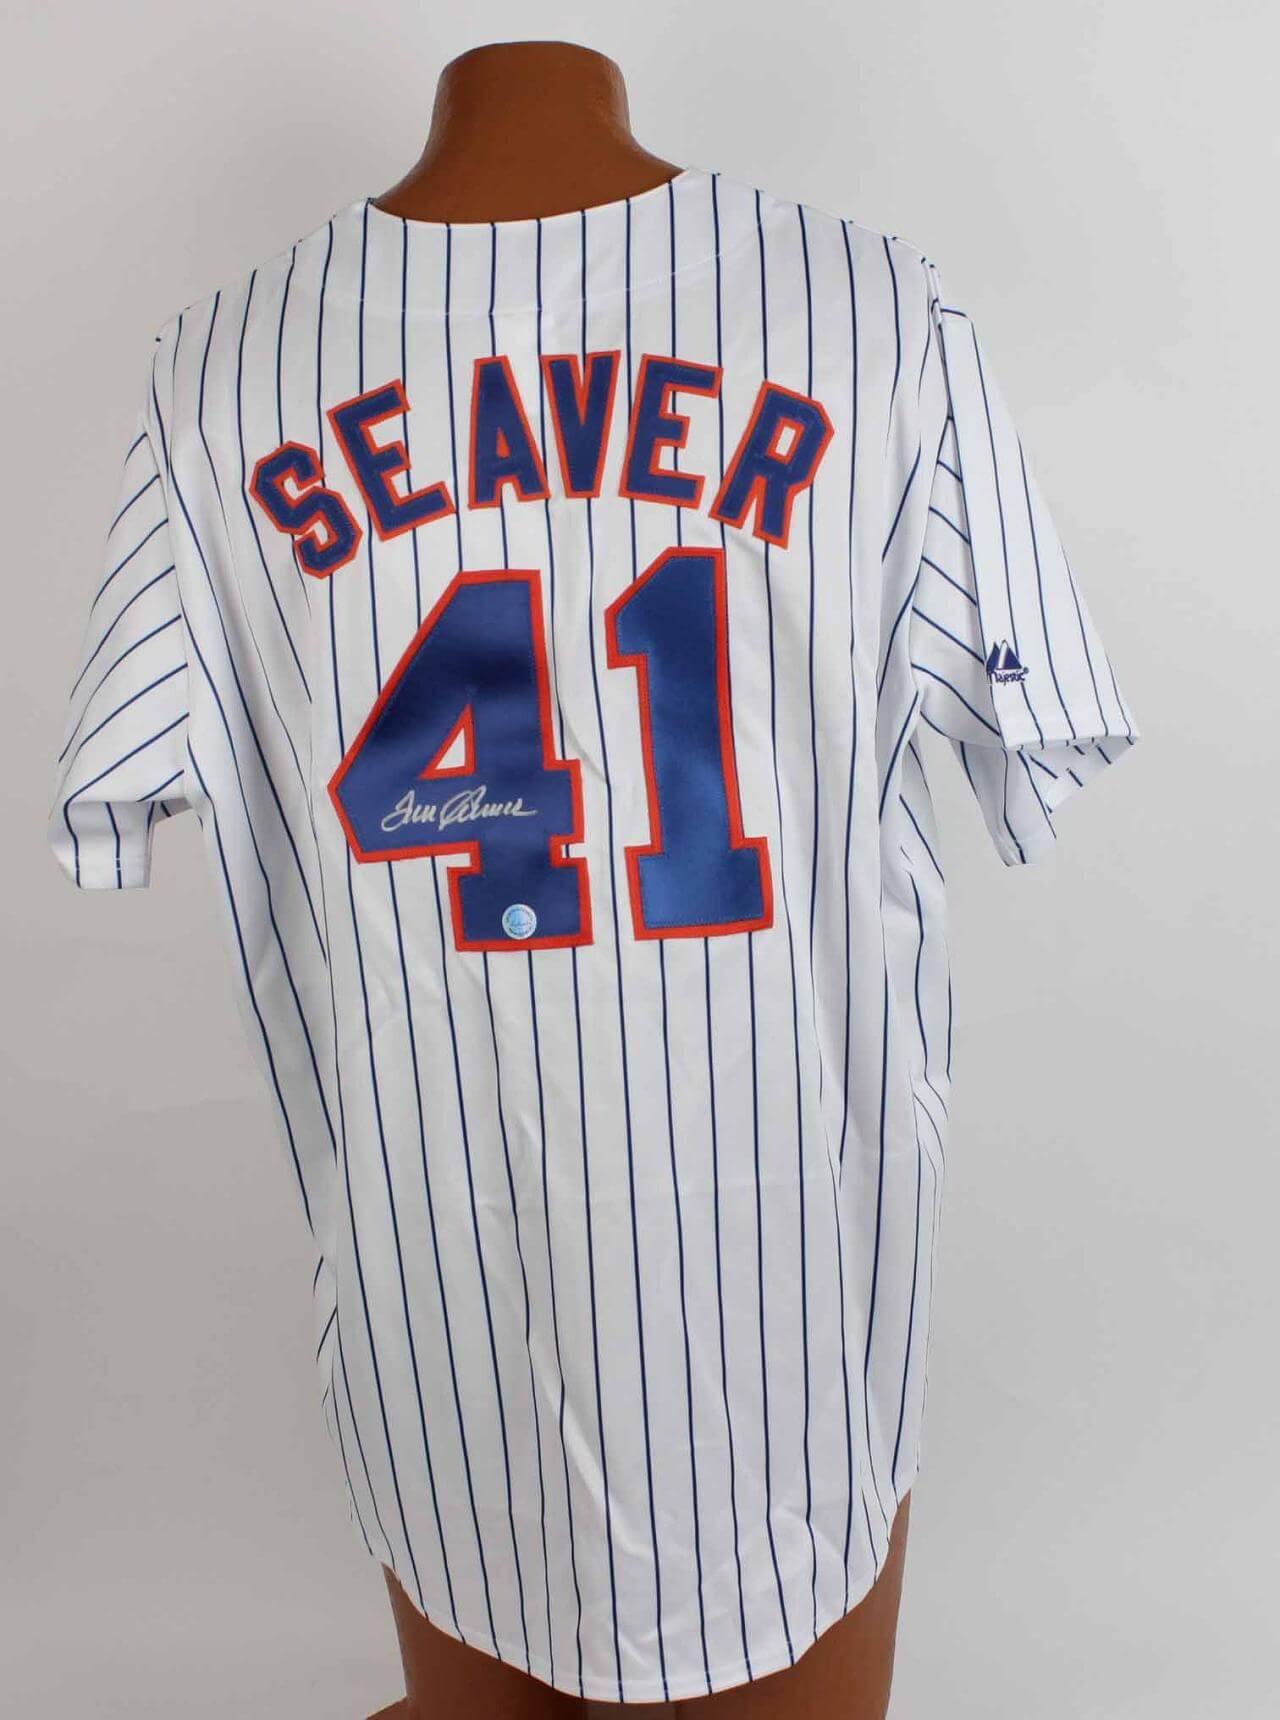 Mets Tom Seaver Autographed Pinstripe Jersey